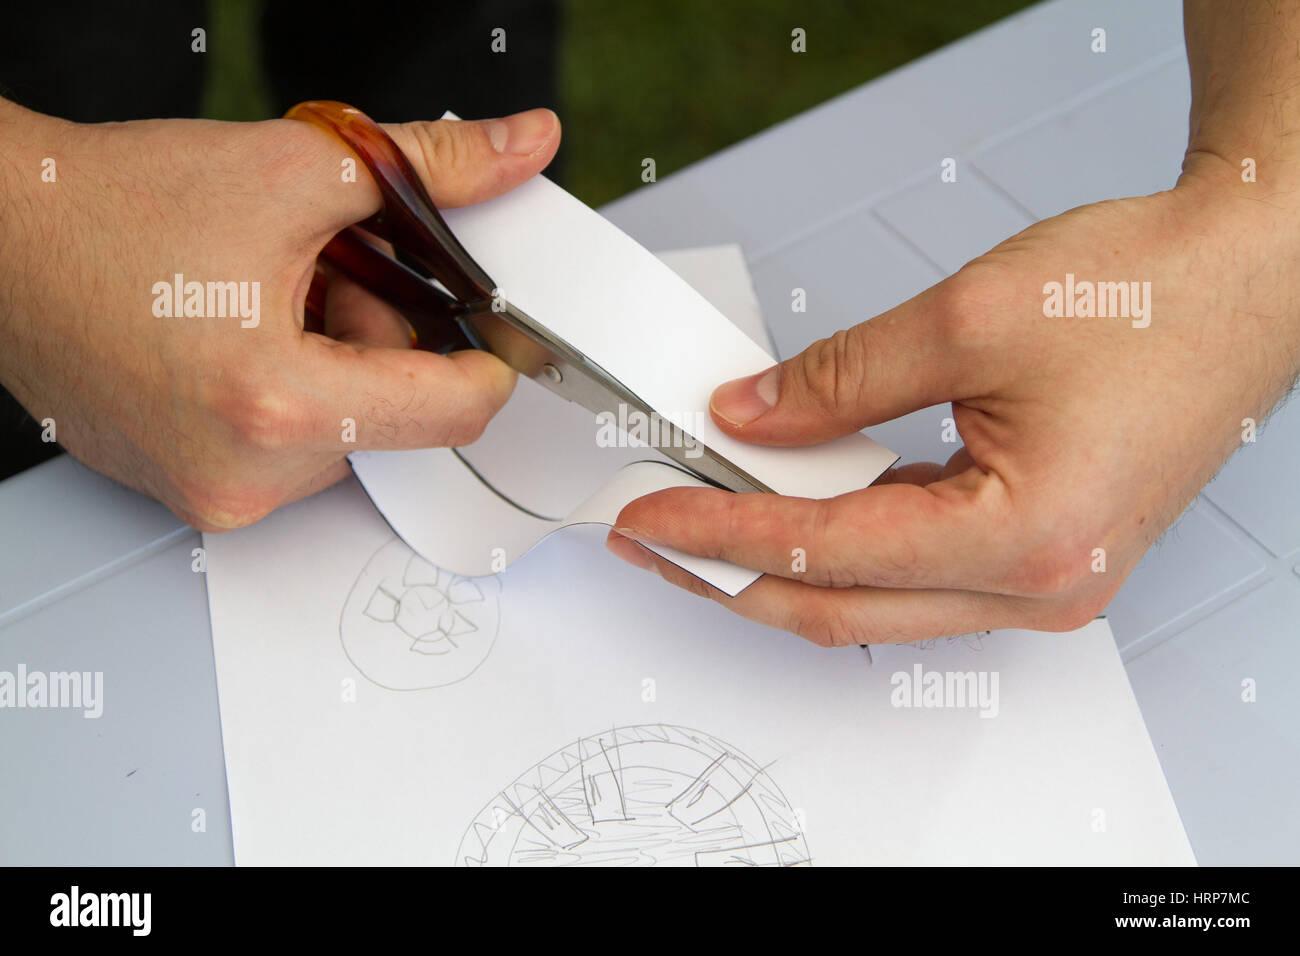 cutting a sheet of green paper using metallic scissors - Stock Image